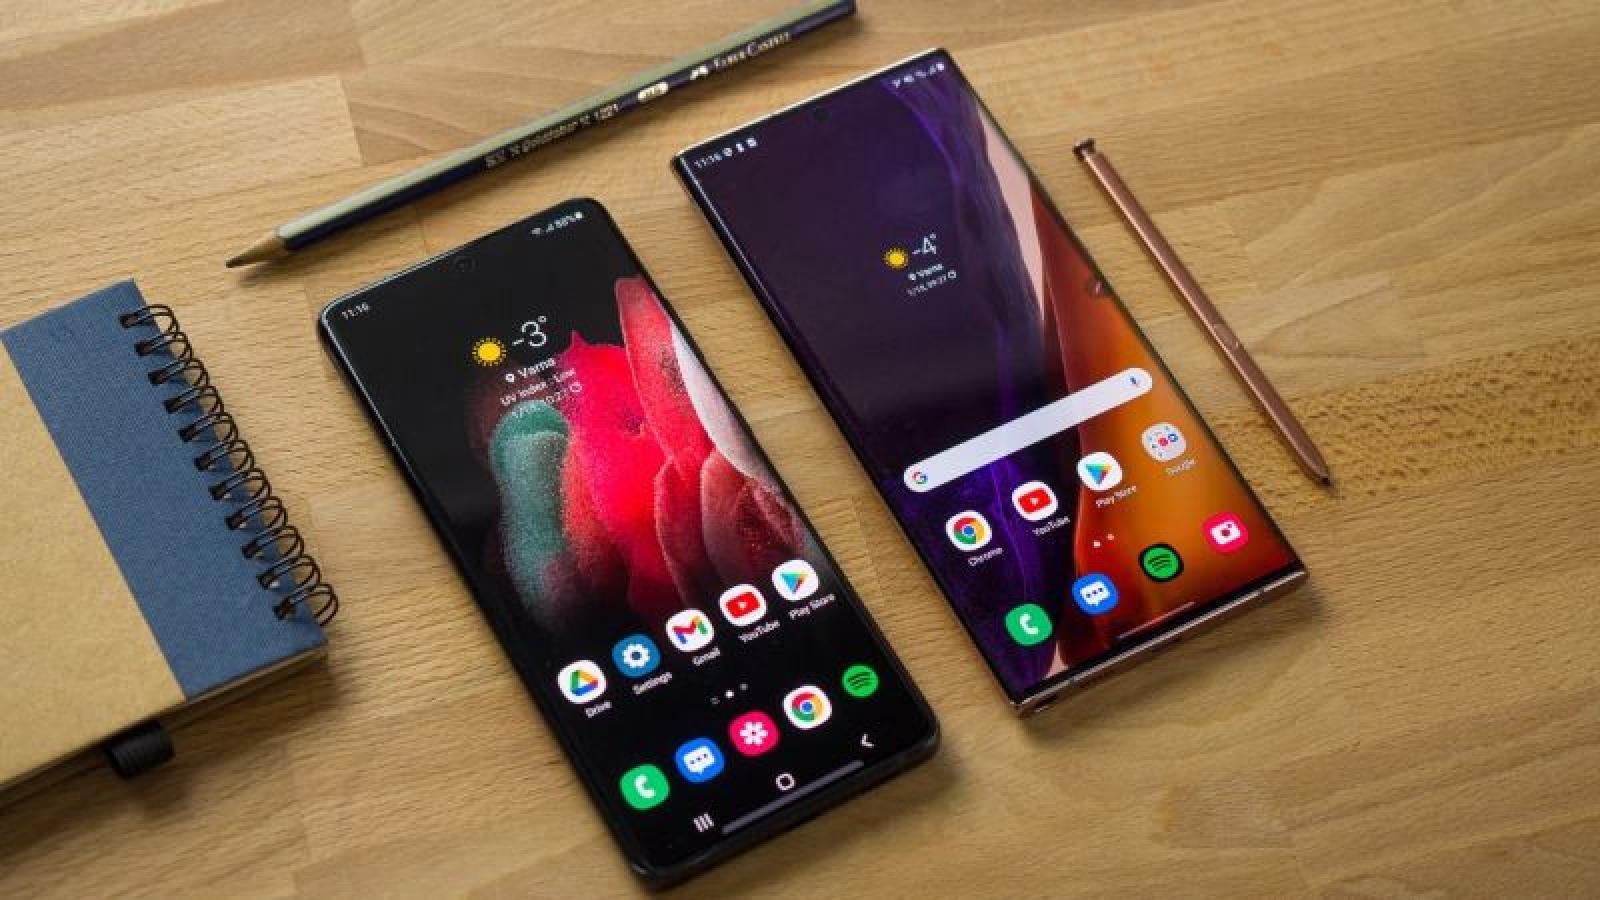 Galaxy Note 22 bị khai tử, Galaxy S22 Ultra thay thế?